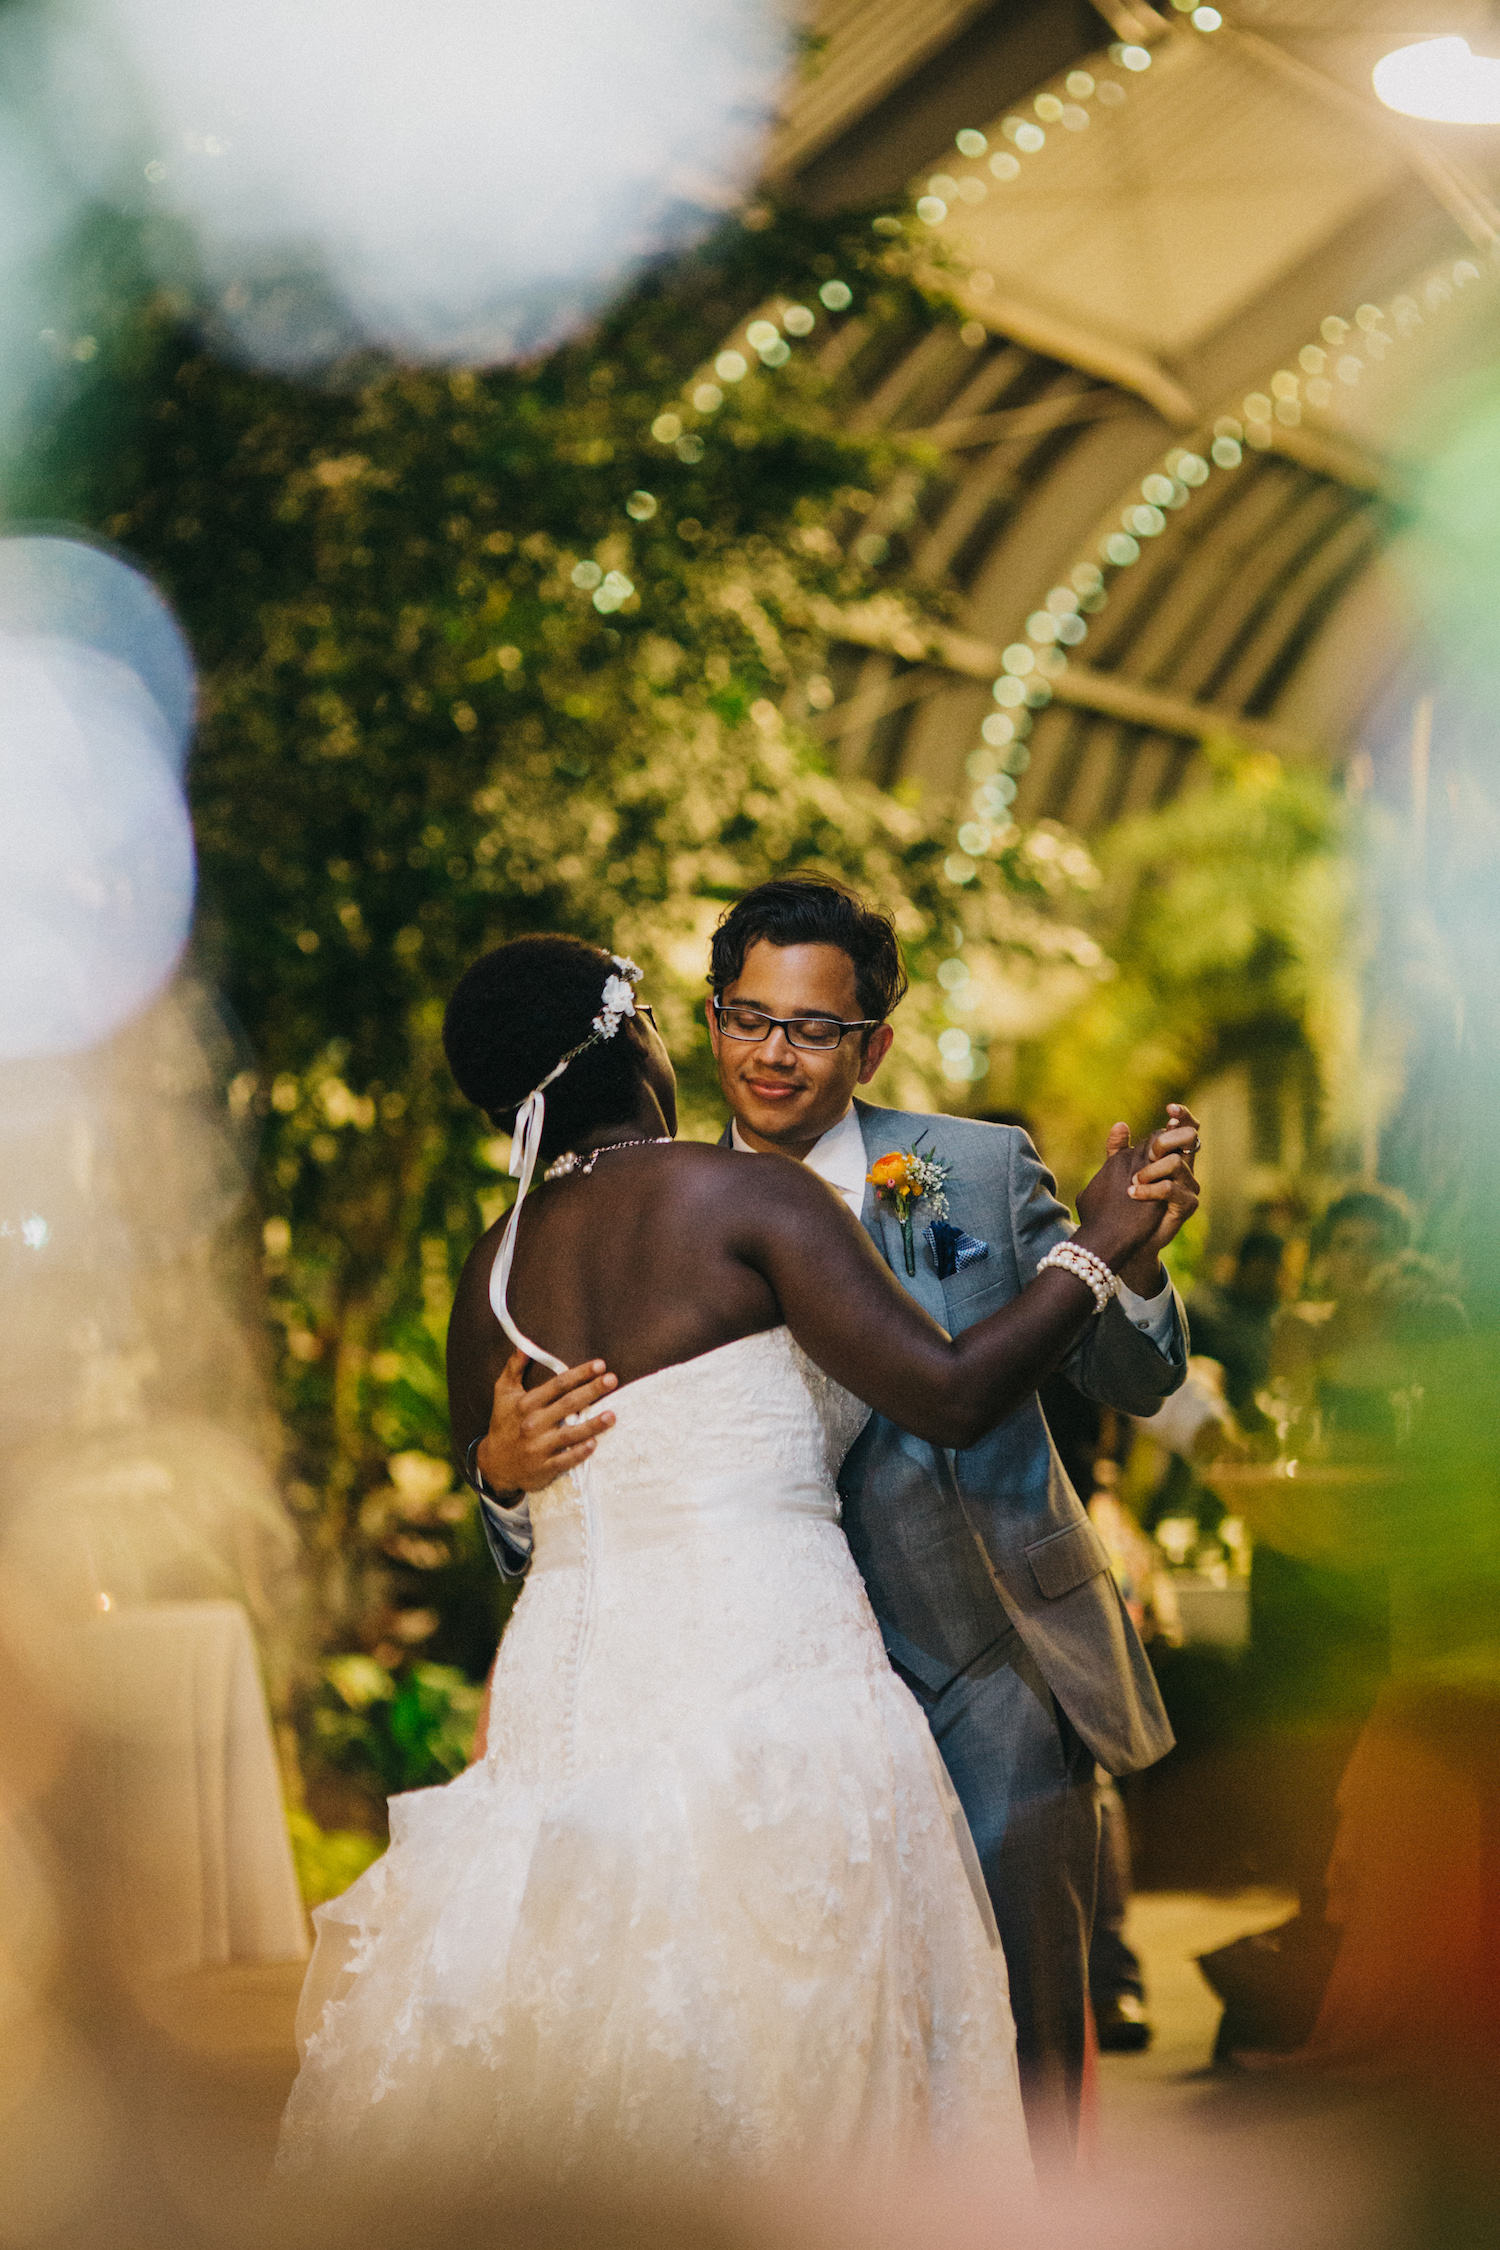 Ashlei & Derrick wedding 0916.jpg